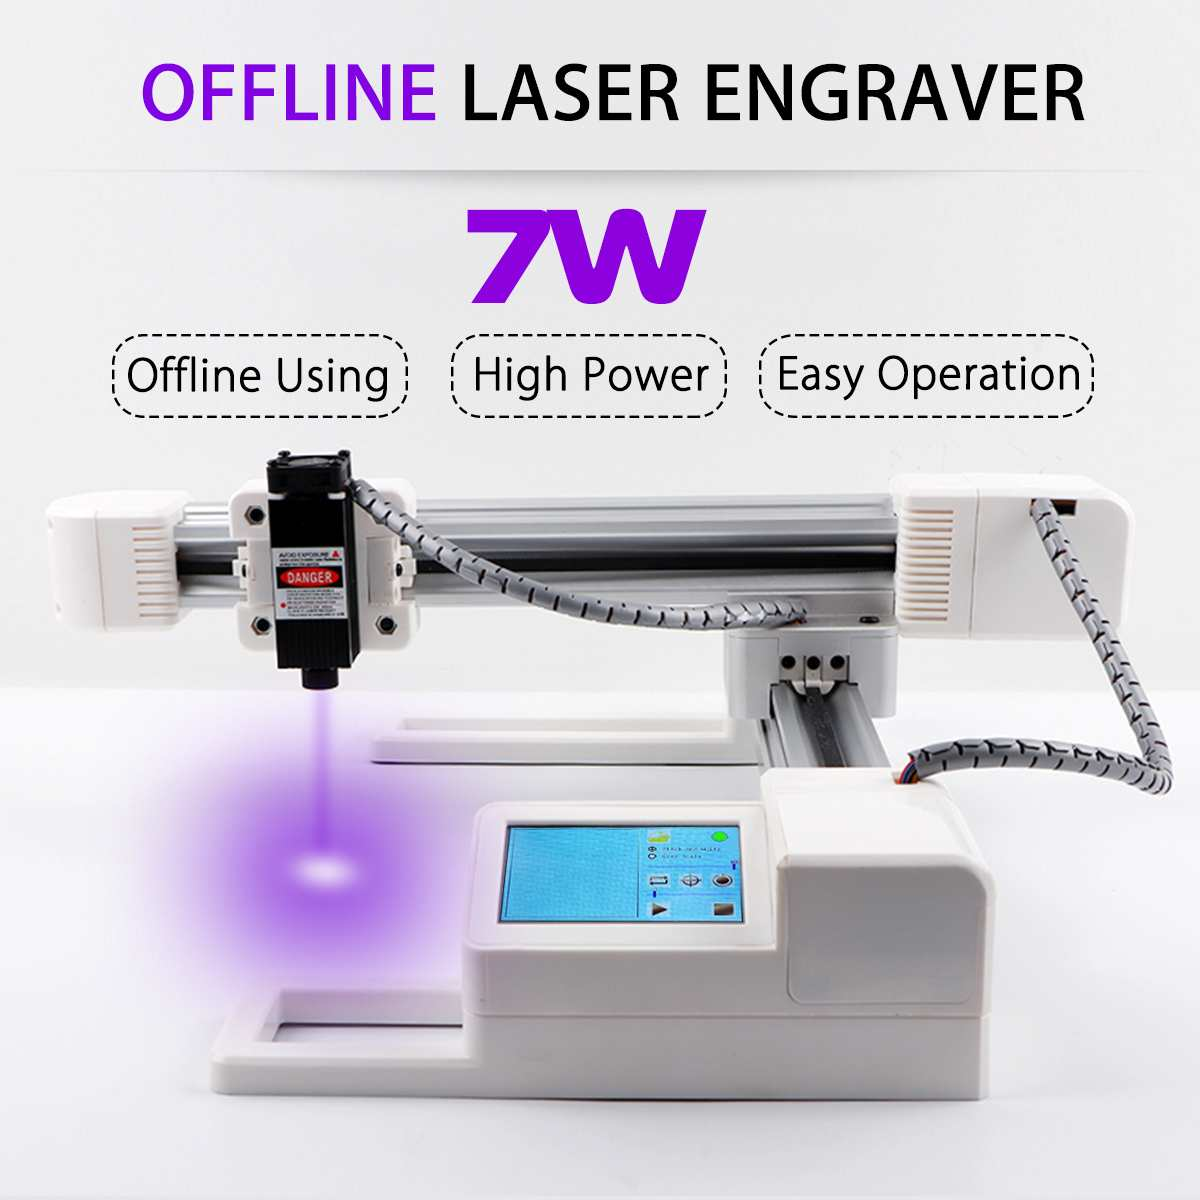 3W/7W USB Offline Laser Engraver DIY Logo Mark Printer CNC Engraving Carving Machine Carving Area 15.5x17.5cm